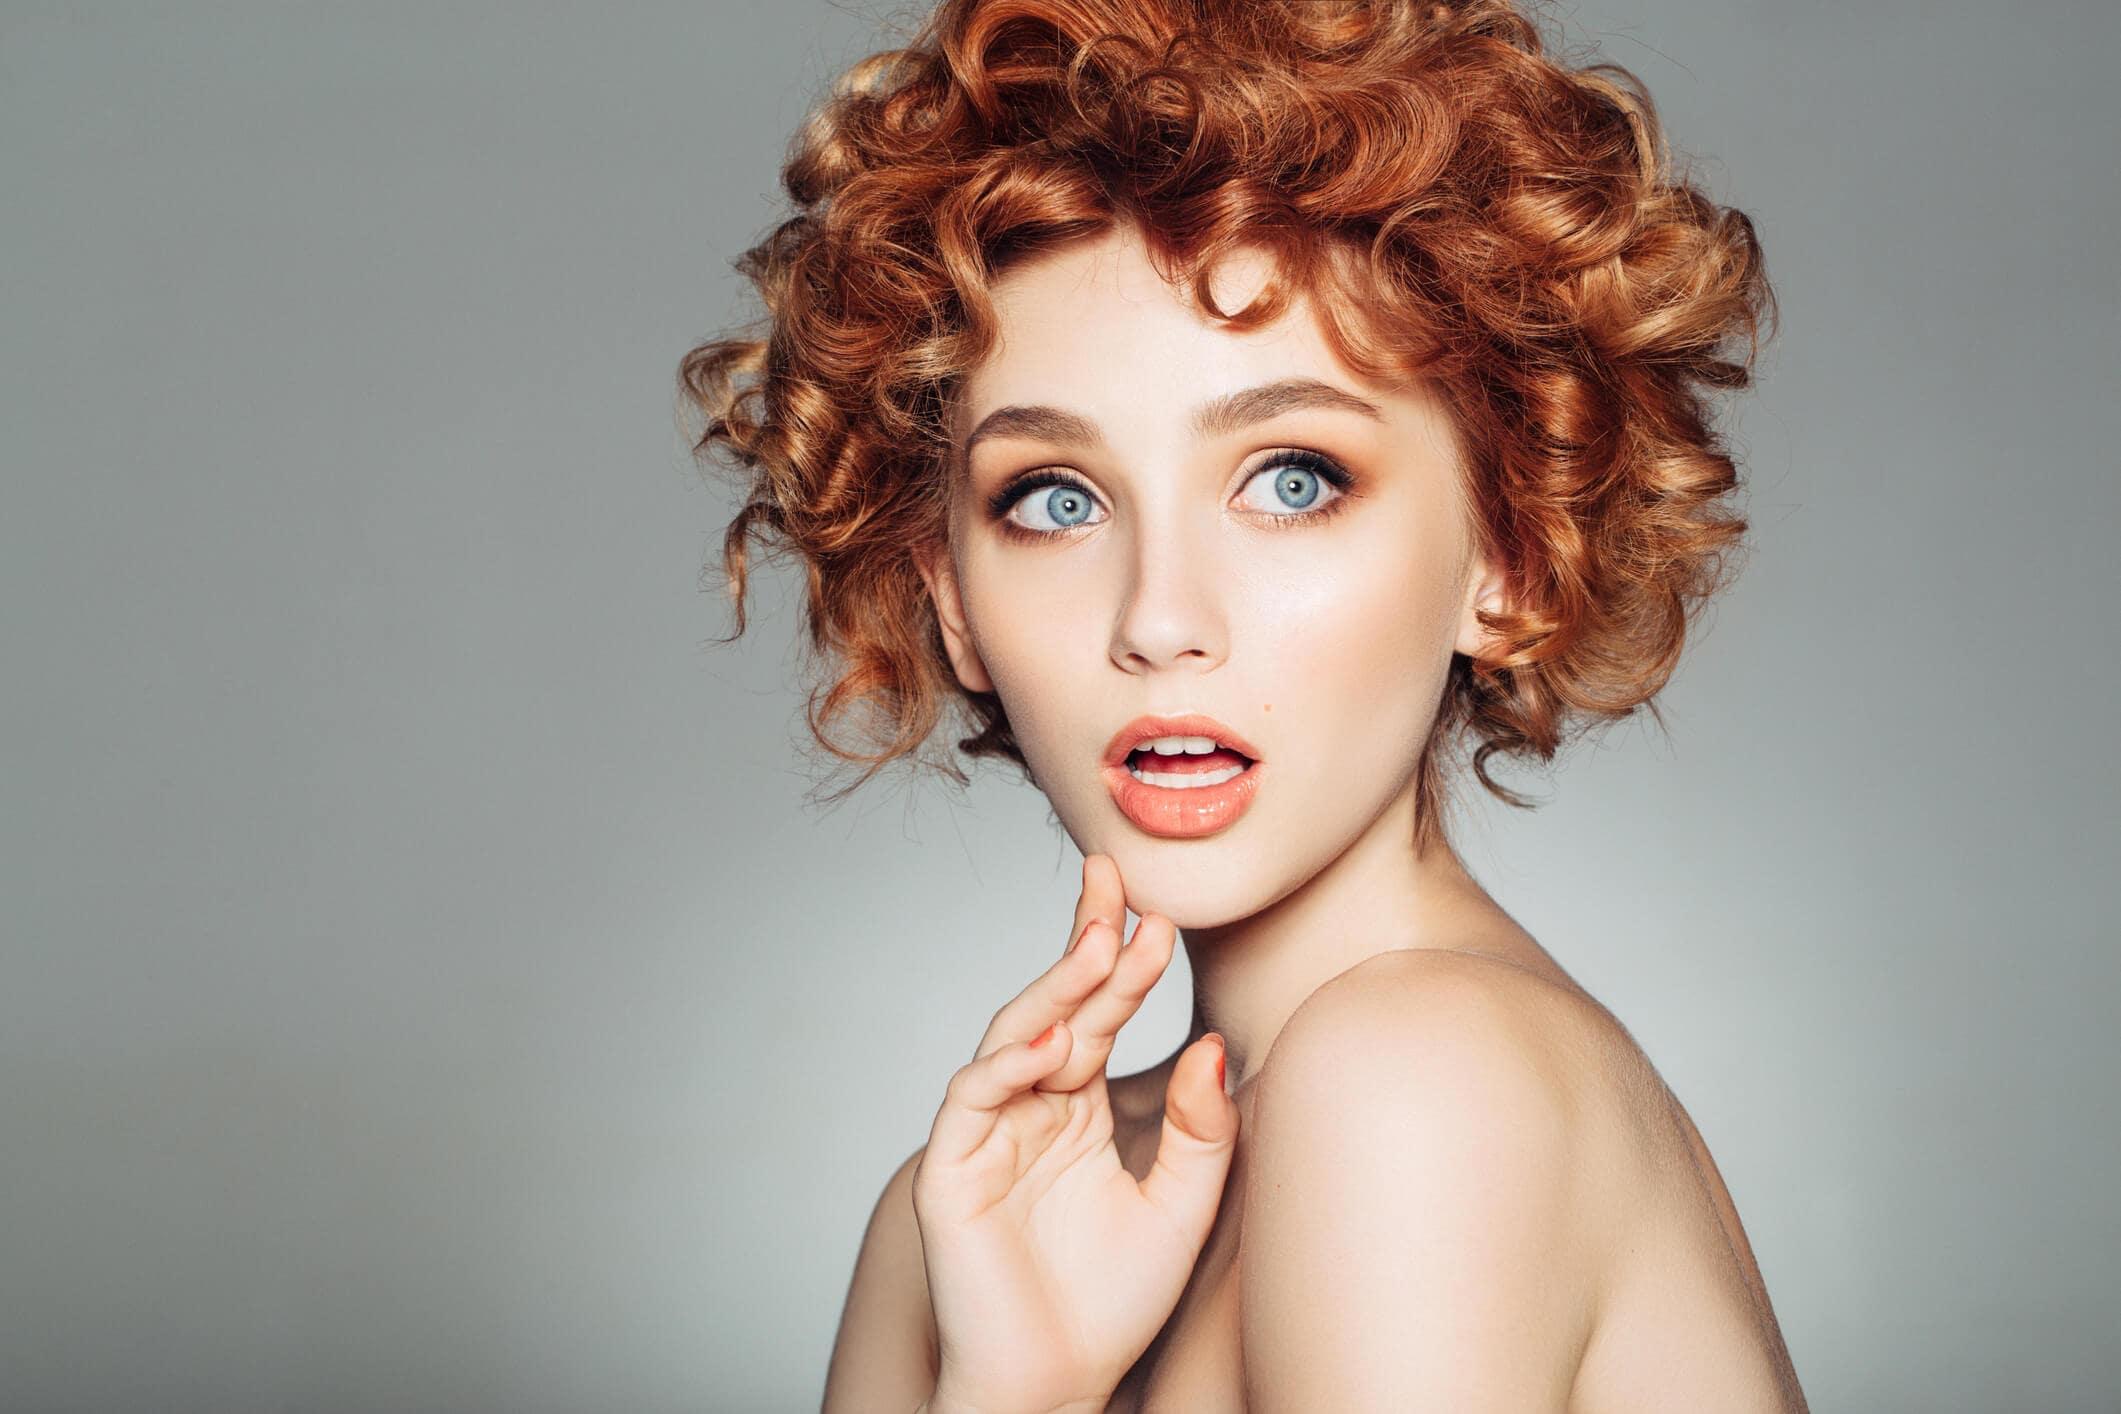 Imagenes de cabello corto rojo